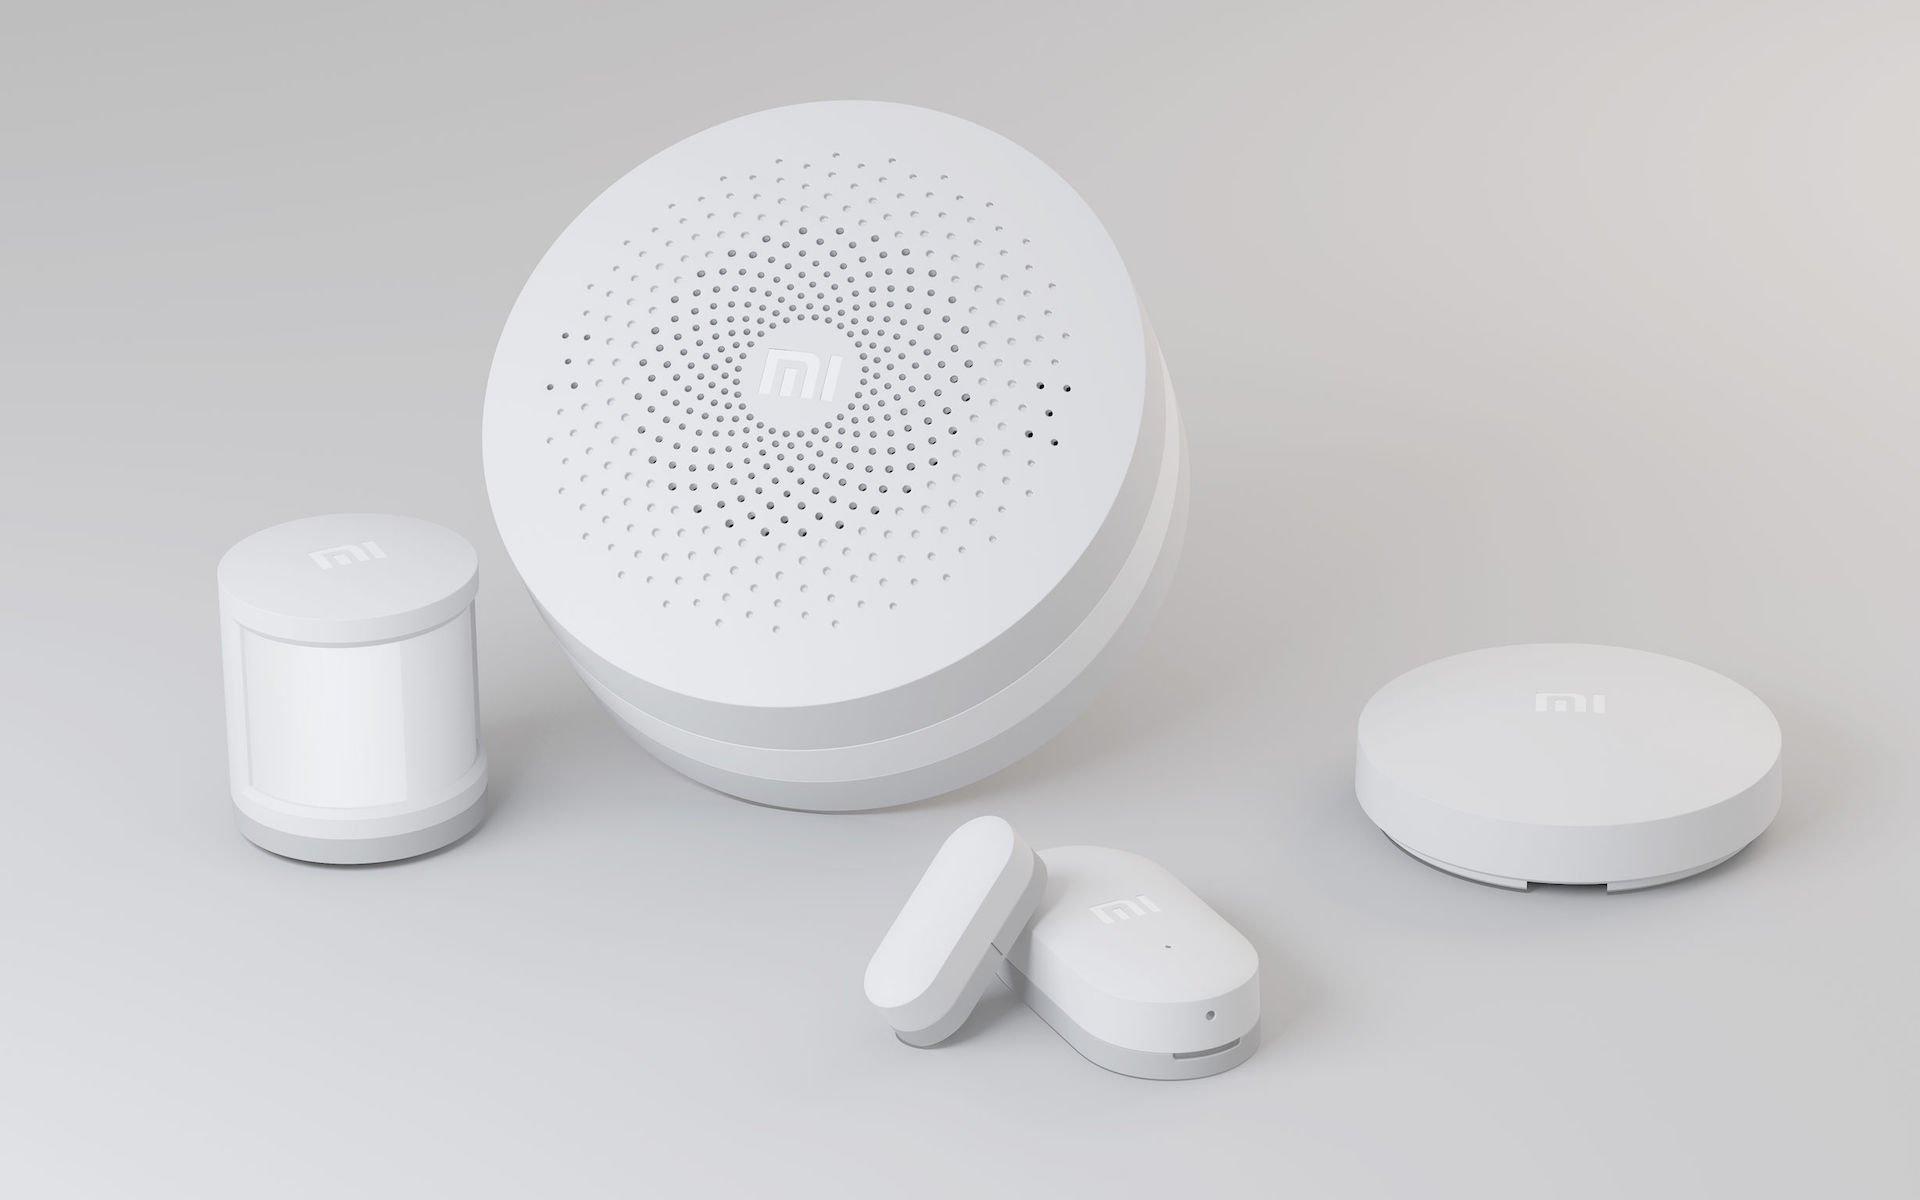 176752 01 MI Smart Home Kit